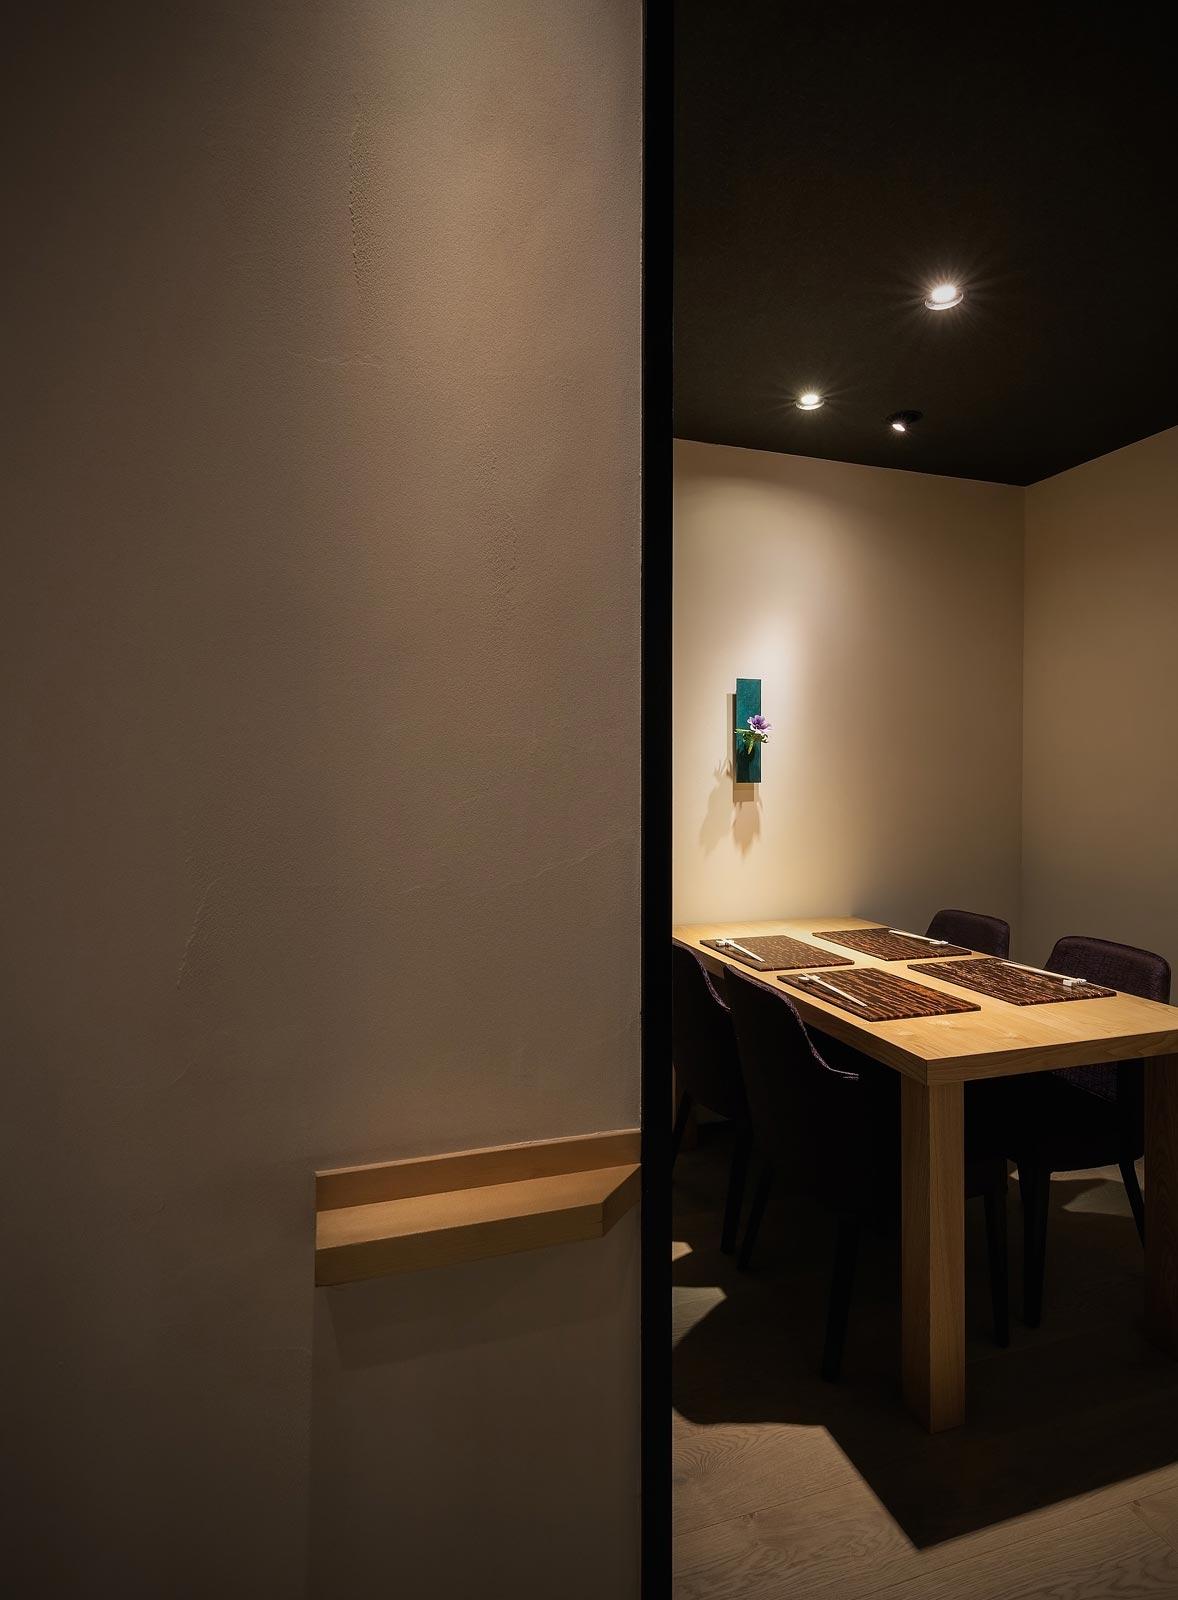 <p> 4人個室:テーブルは栗の木。床はフローリング </p>